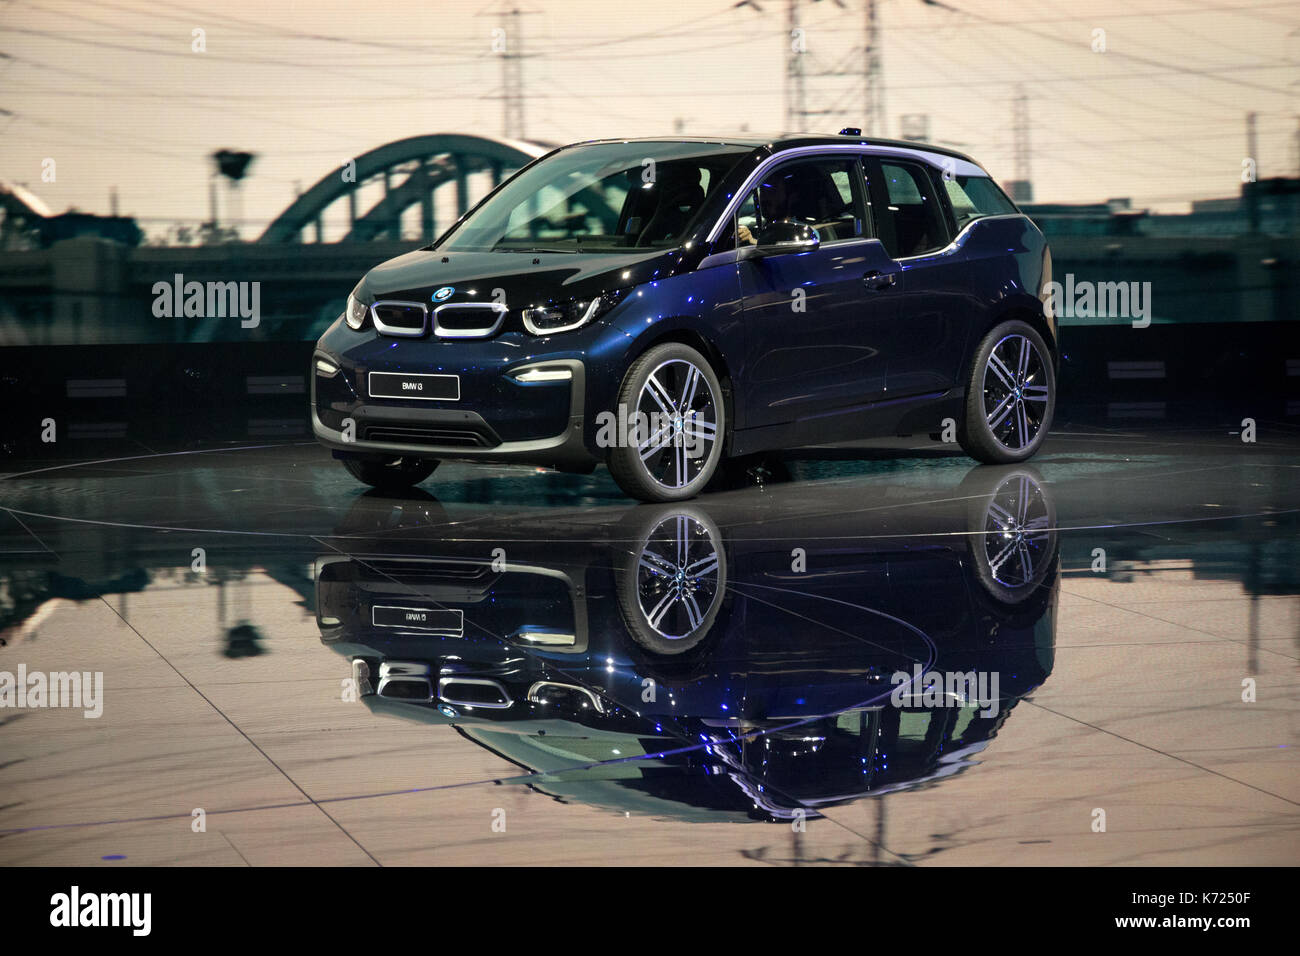 2018 bmw electric.  2018 frankfurt germany 13th sep 2017 new 2018 bmw i3 electric car presented  at the frankfurt iaa motor show credit jlbvdwolfalamy live news to bmw